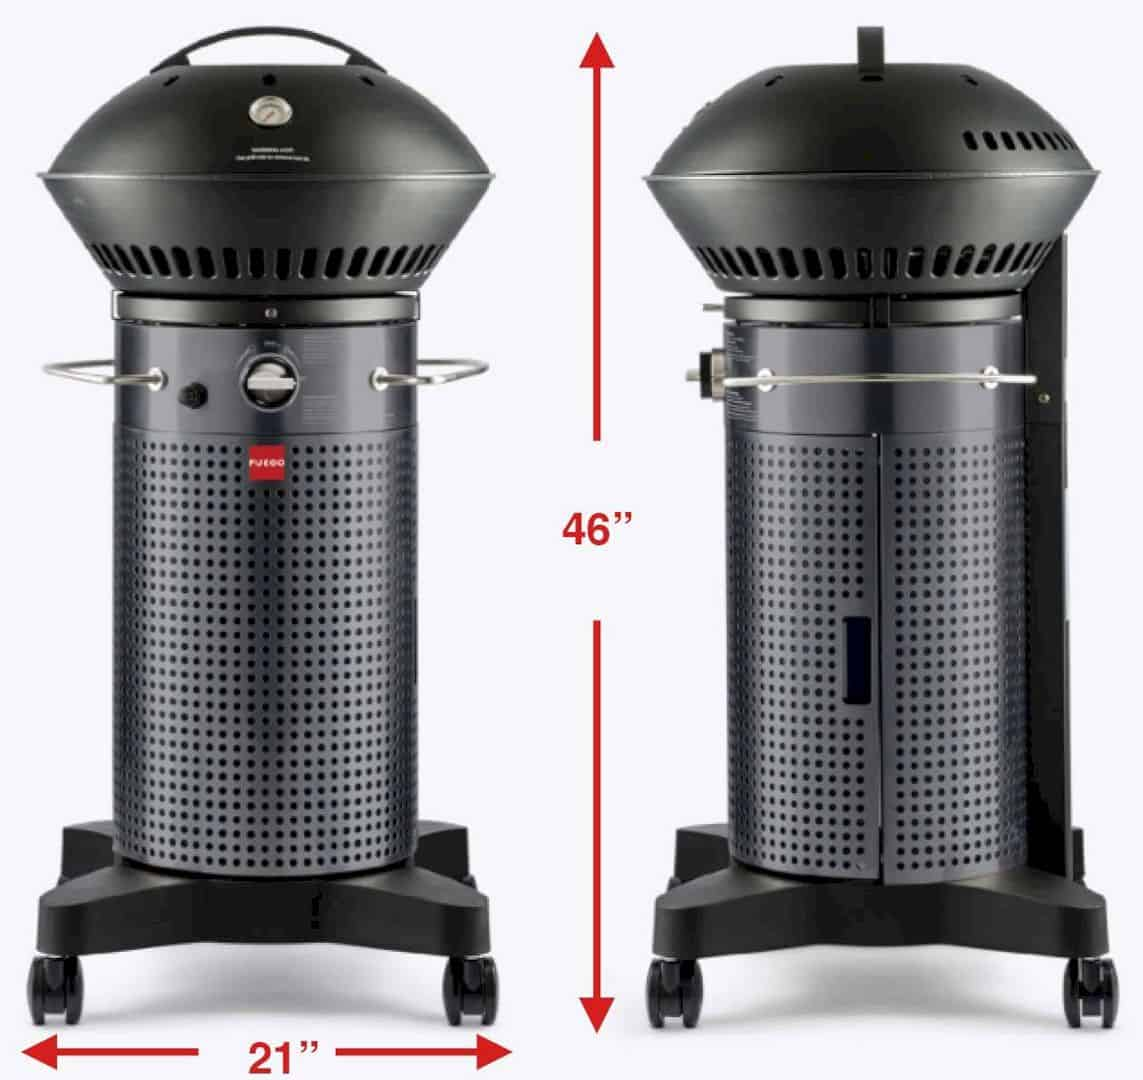 Fuego Element F21C 5